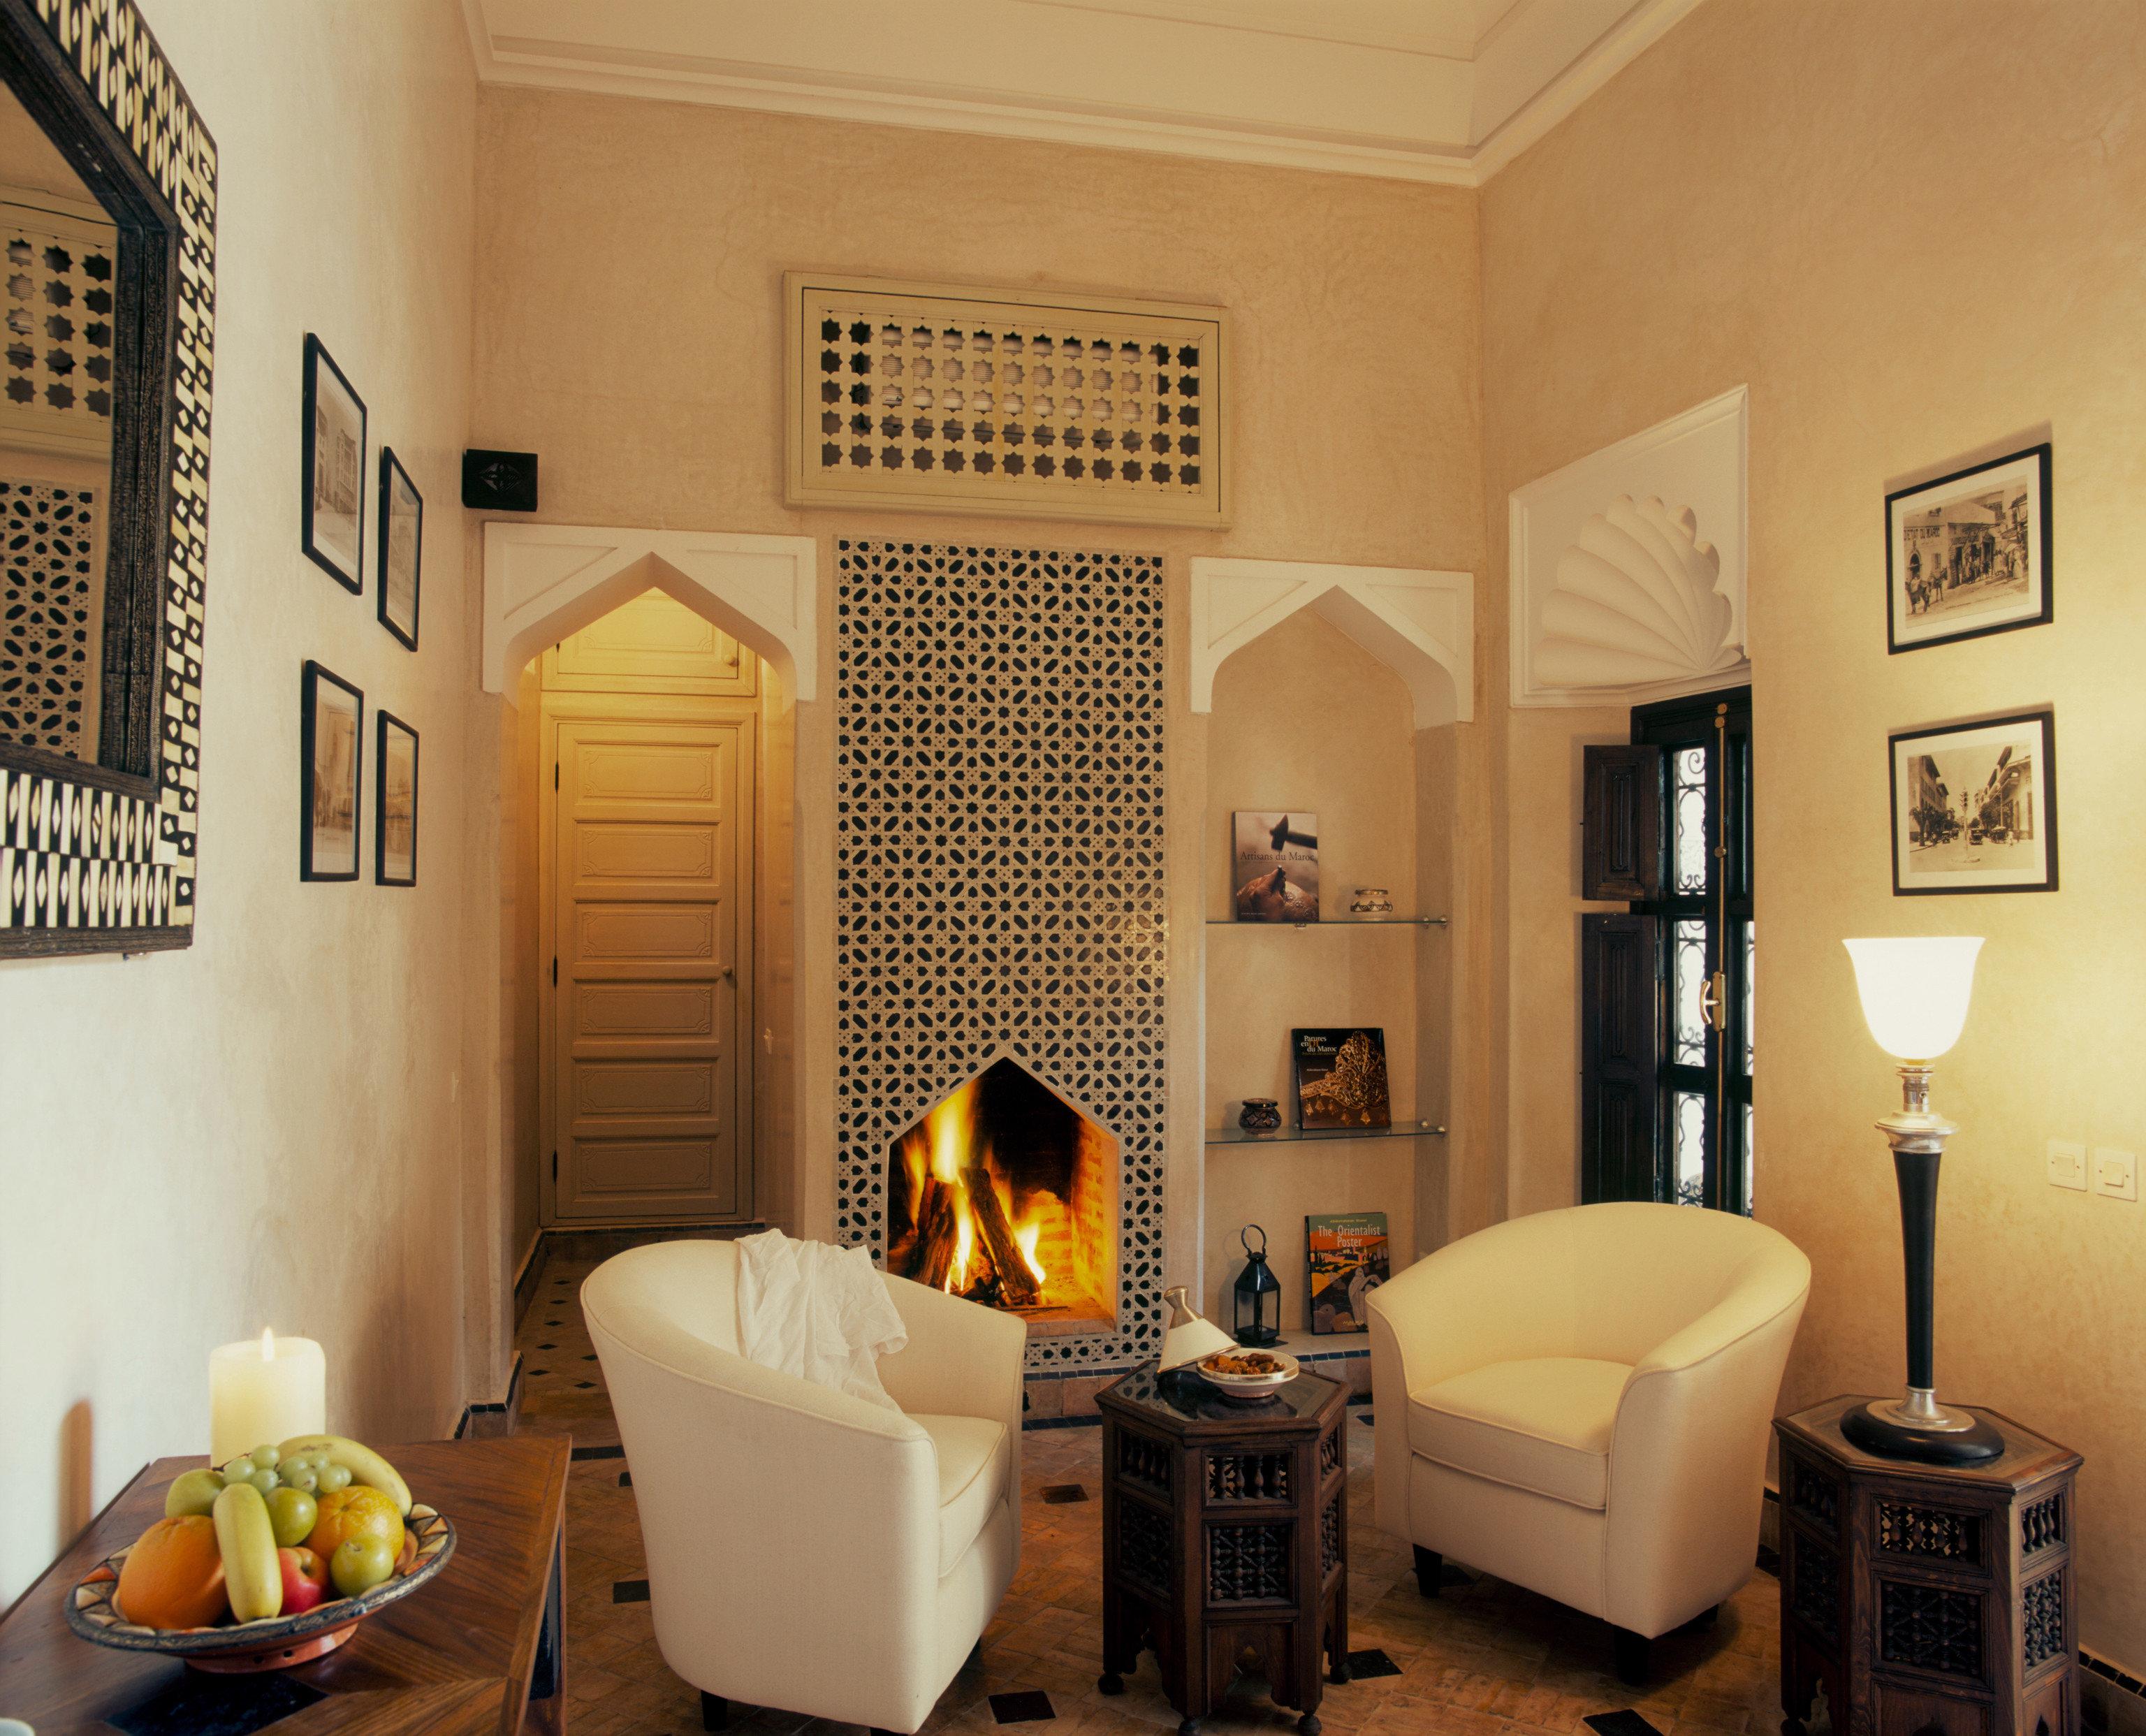 Hotels Romance property living room home condominium Suite cottage Villa